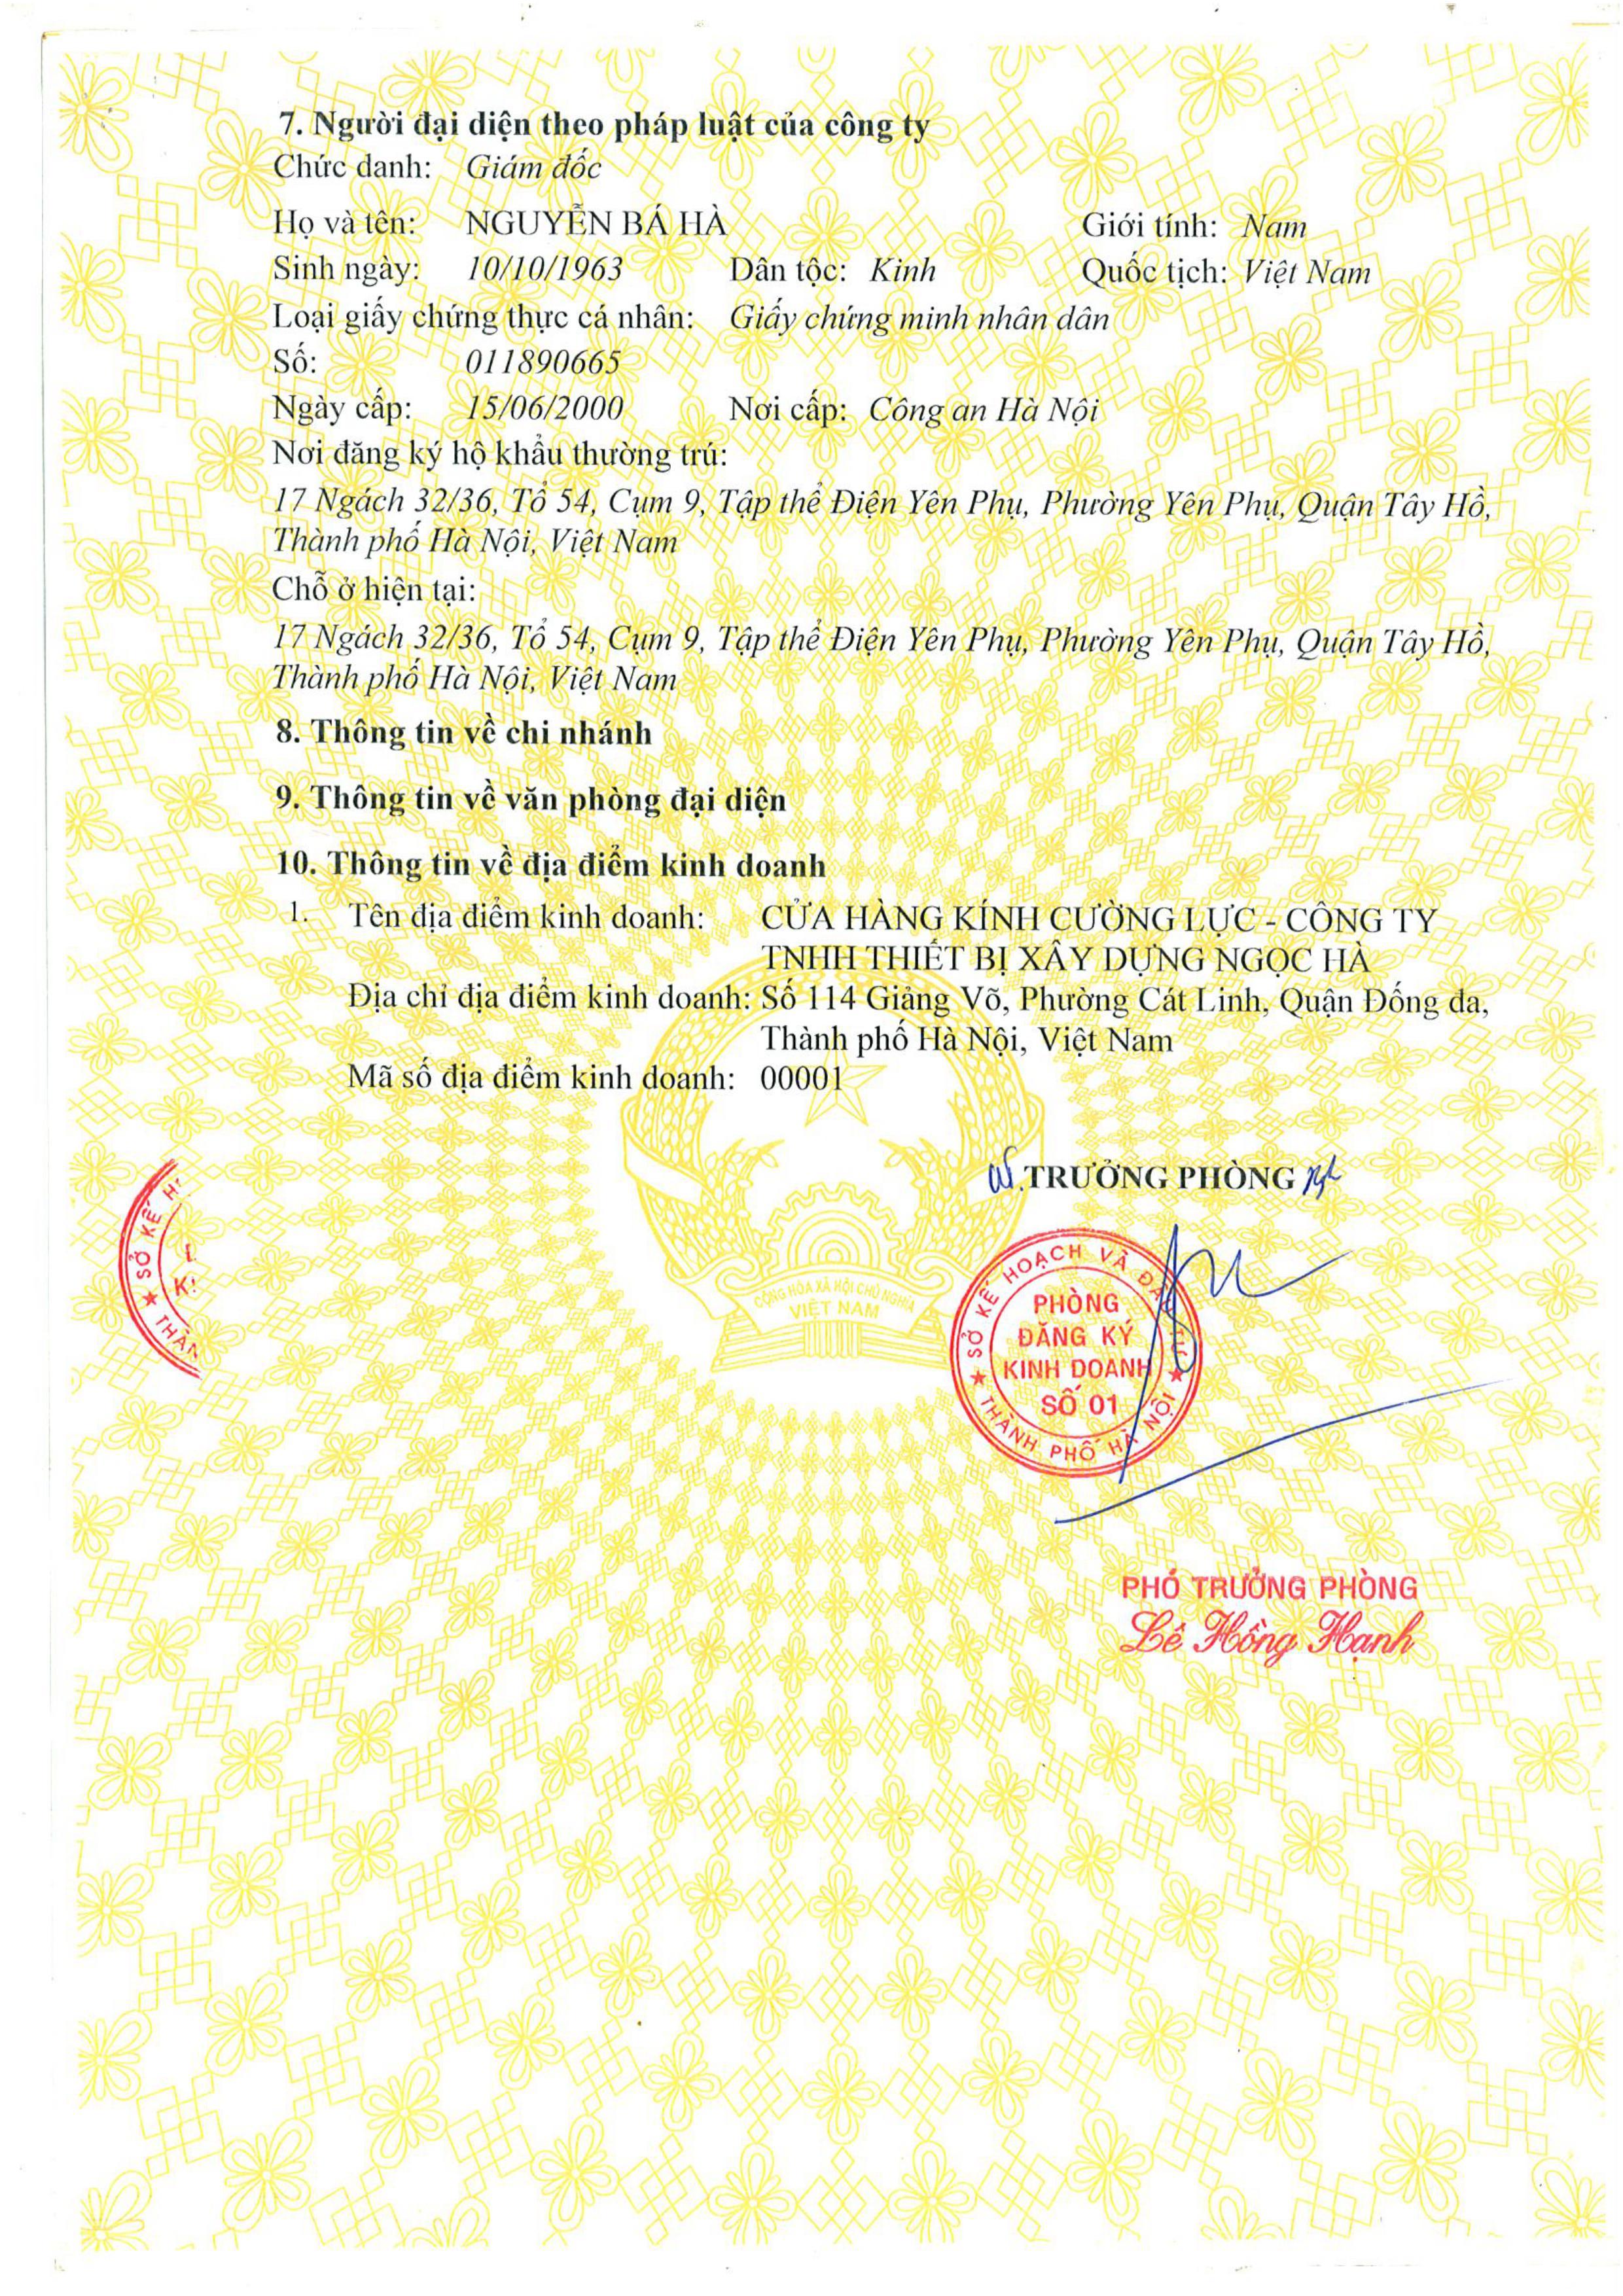 giấy đăng ký kinh doanh 3